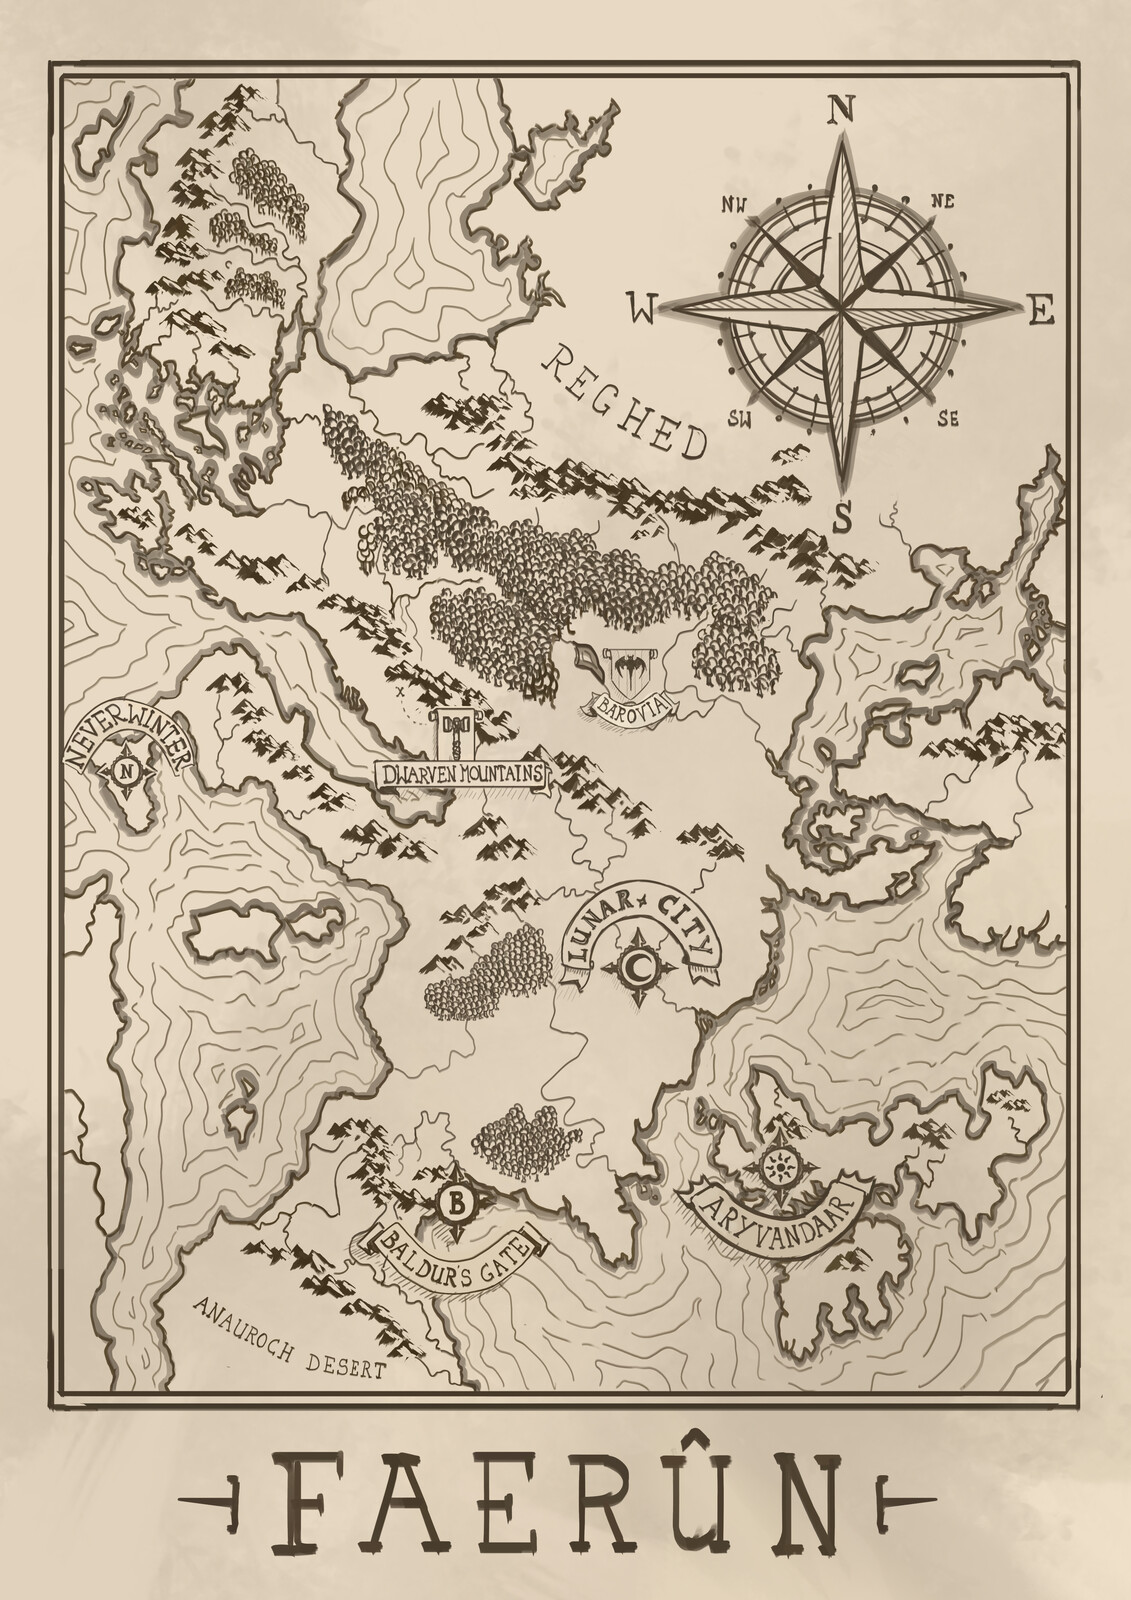 Map of Fearun